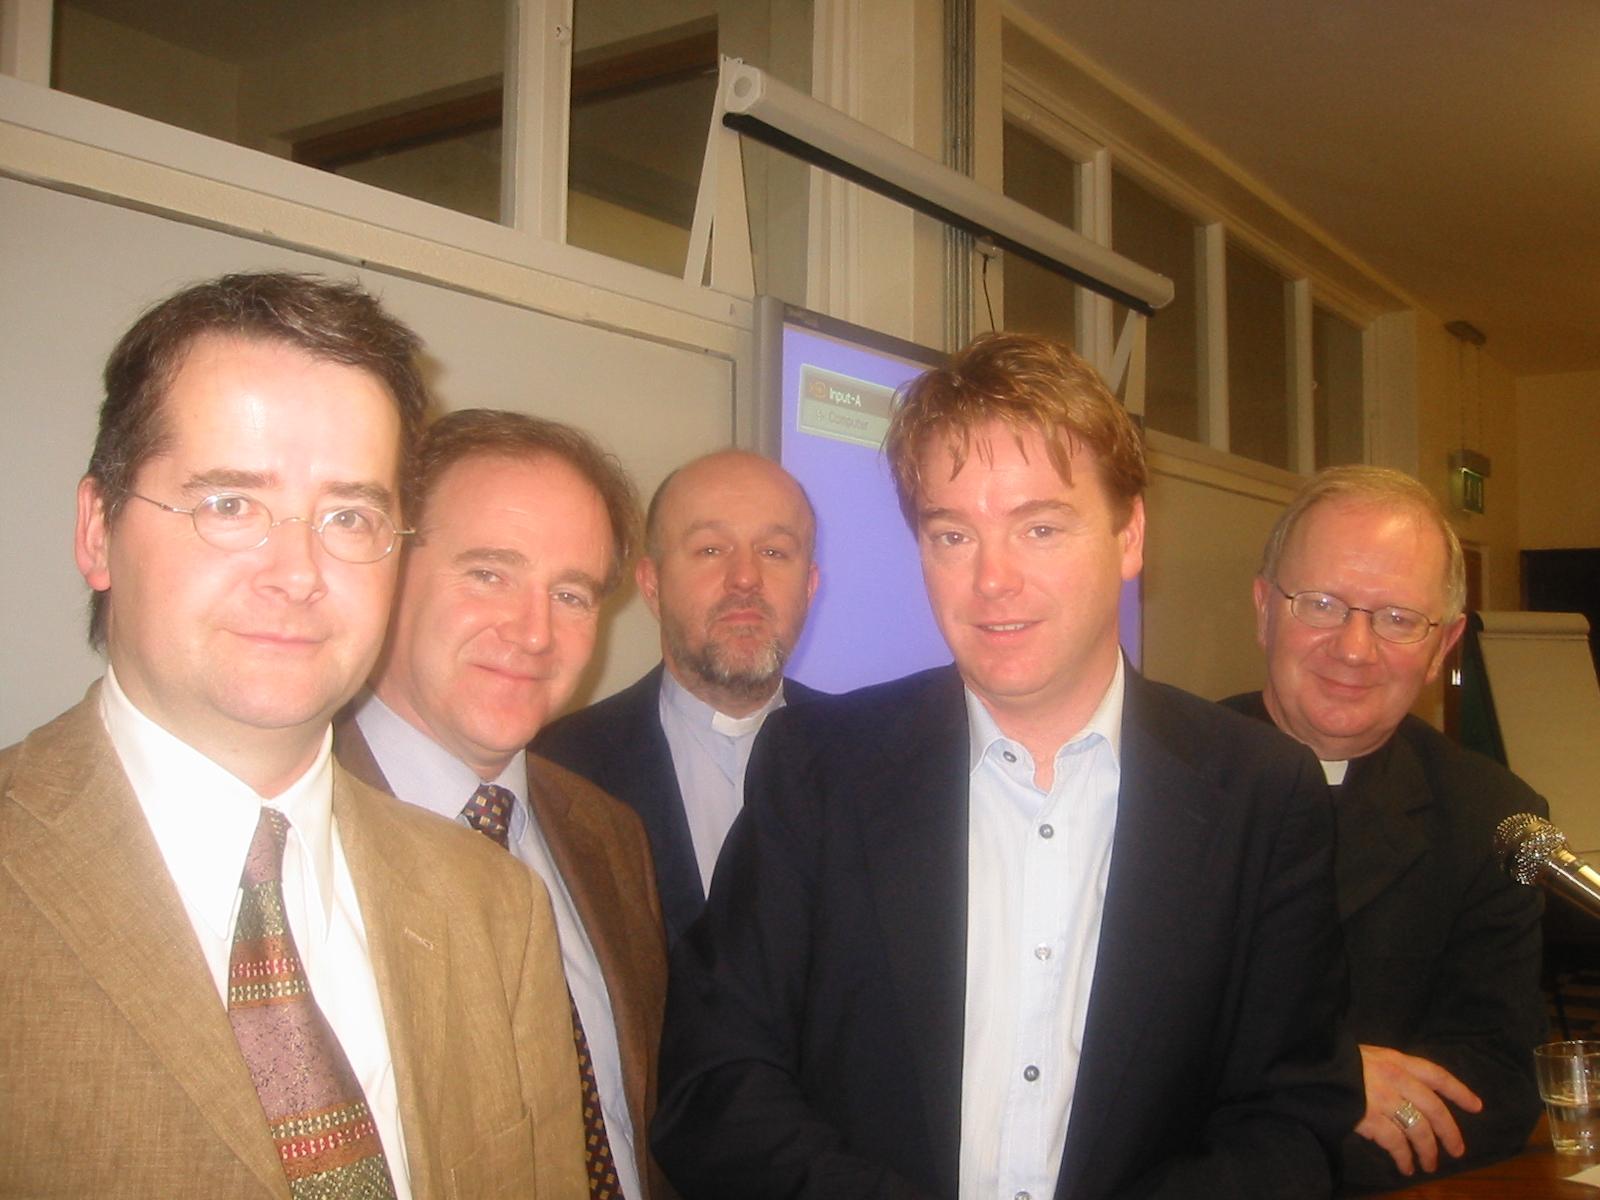 Patsy McGarry (Irish Times) & David McWilliams speak at Hard Gospel Project conference